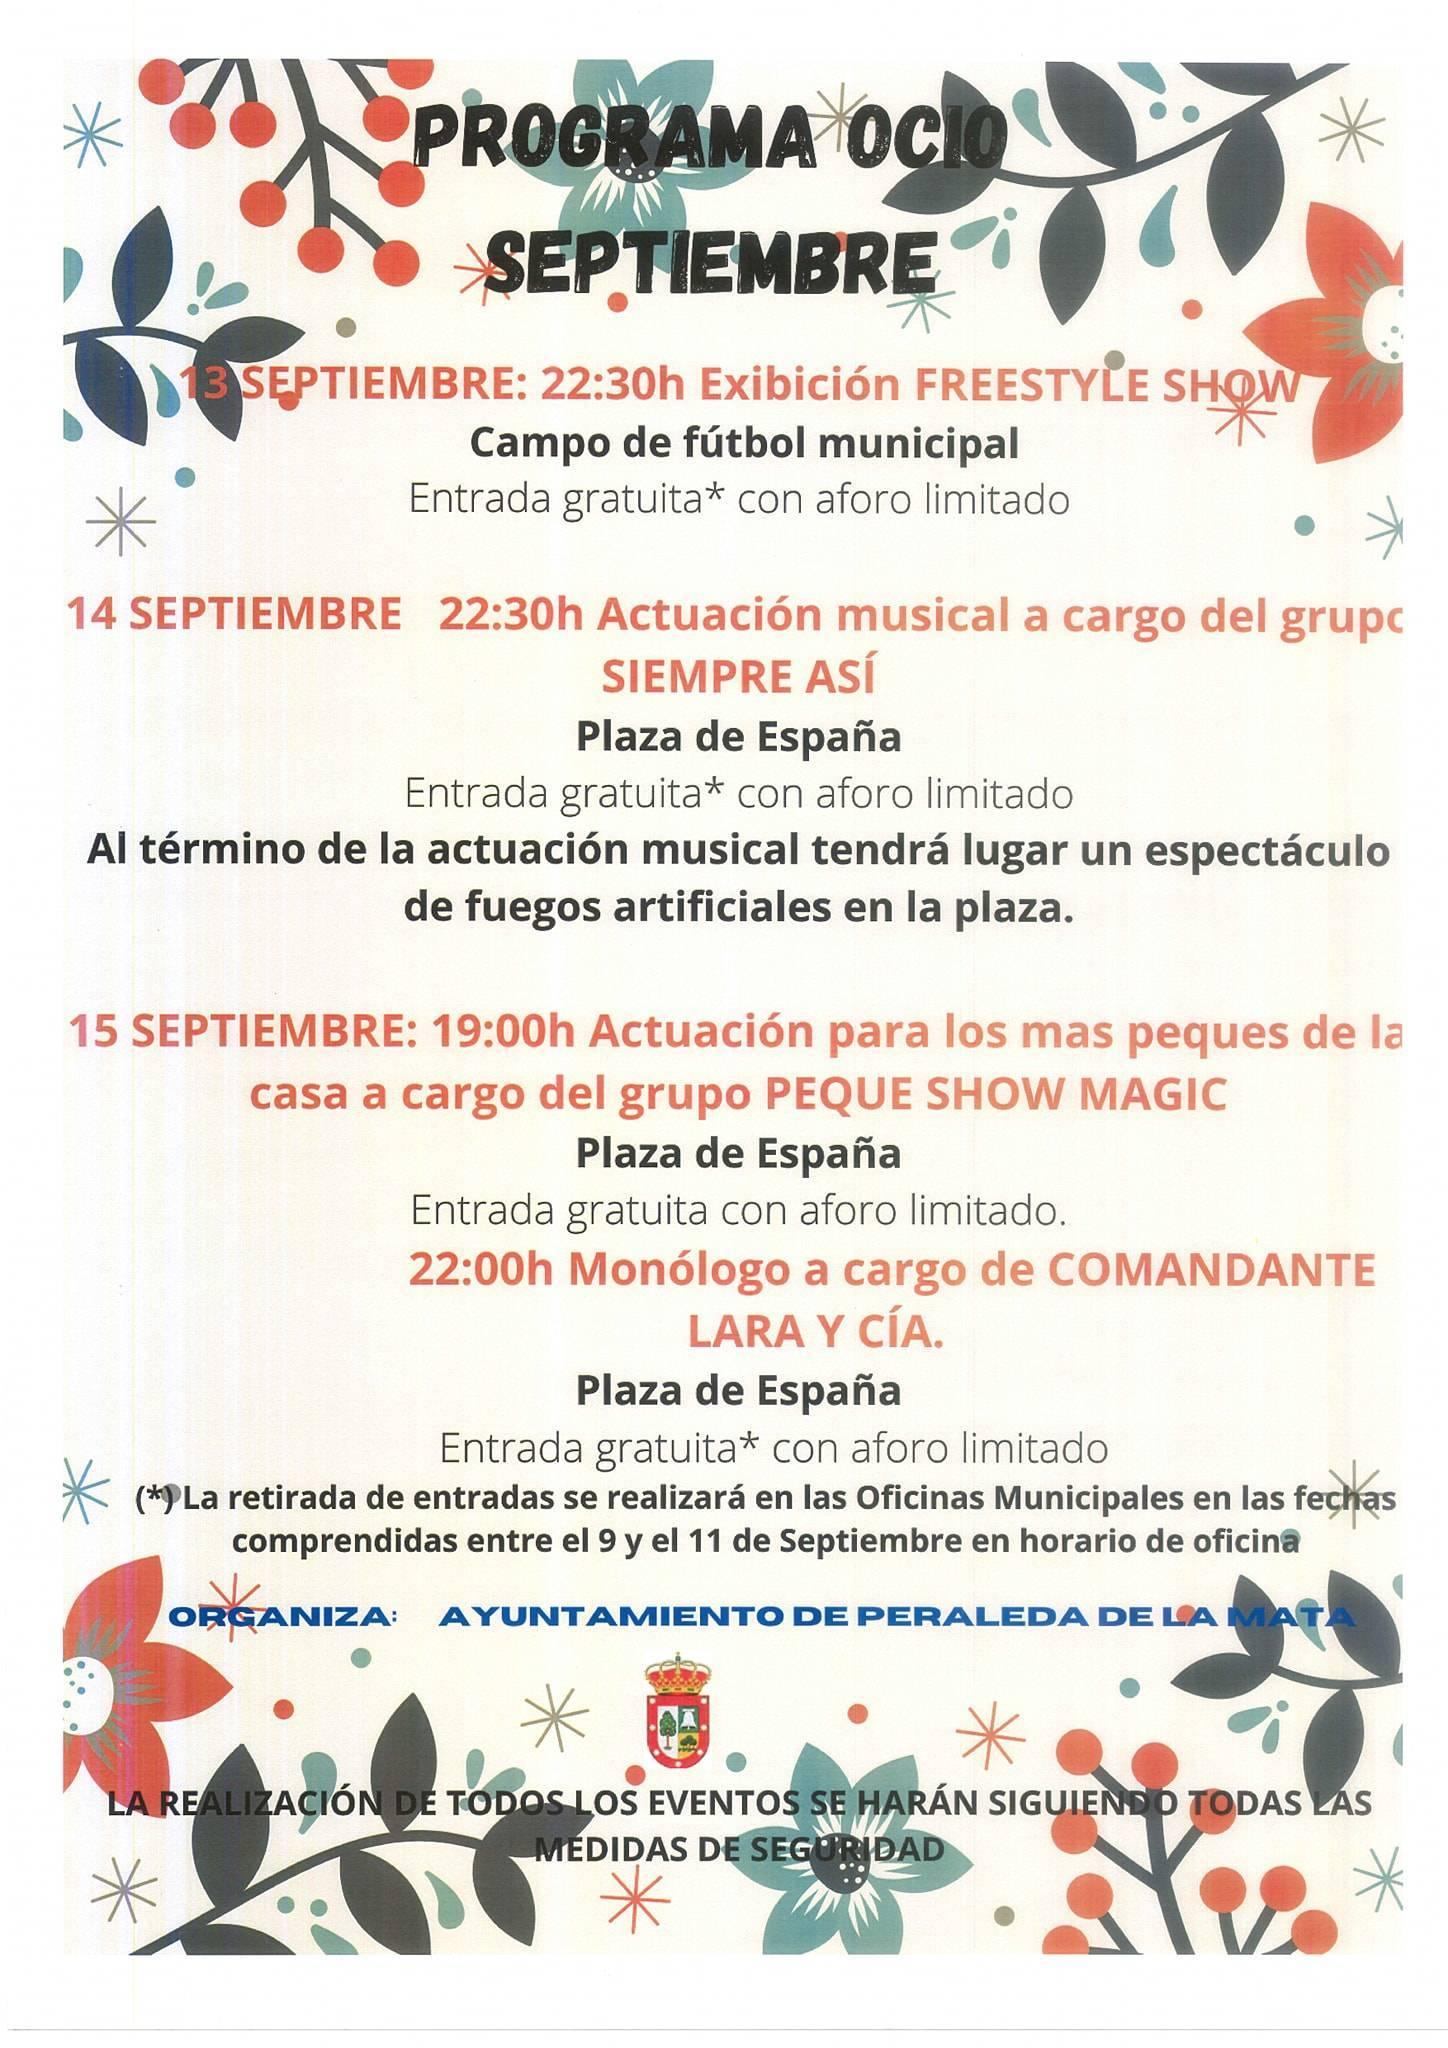 Programa de ocio (septiembre 2020) - Peraleda de la Mata (Cáceres)